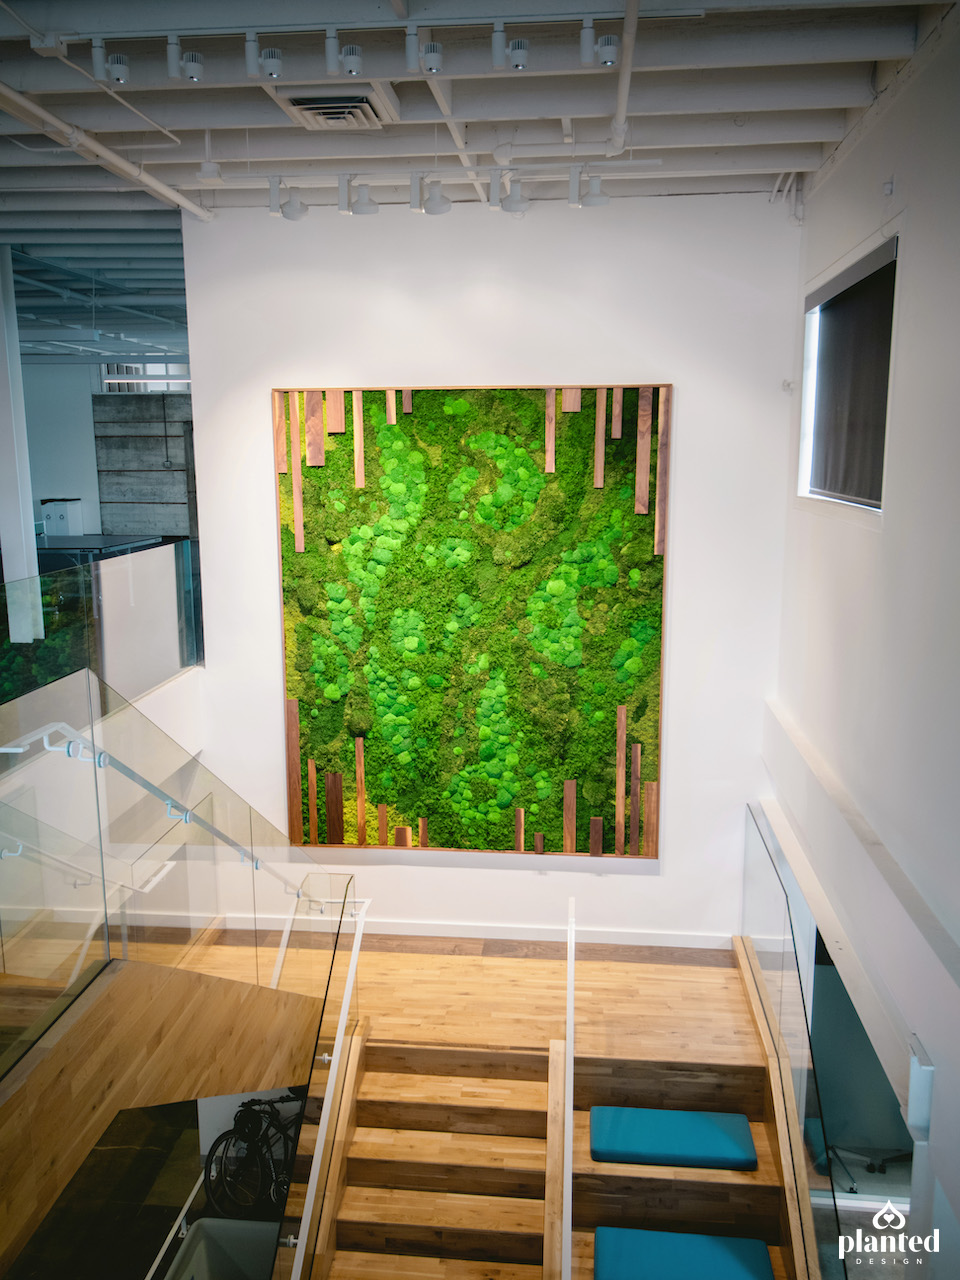 PlantedDesign_MossWall_PerfectDayFoods_Emeryville_California_Office-2_fixed.jpg